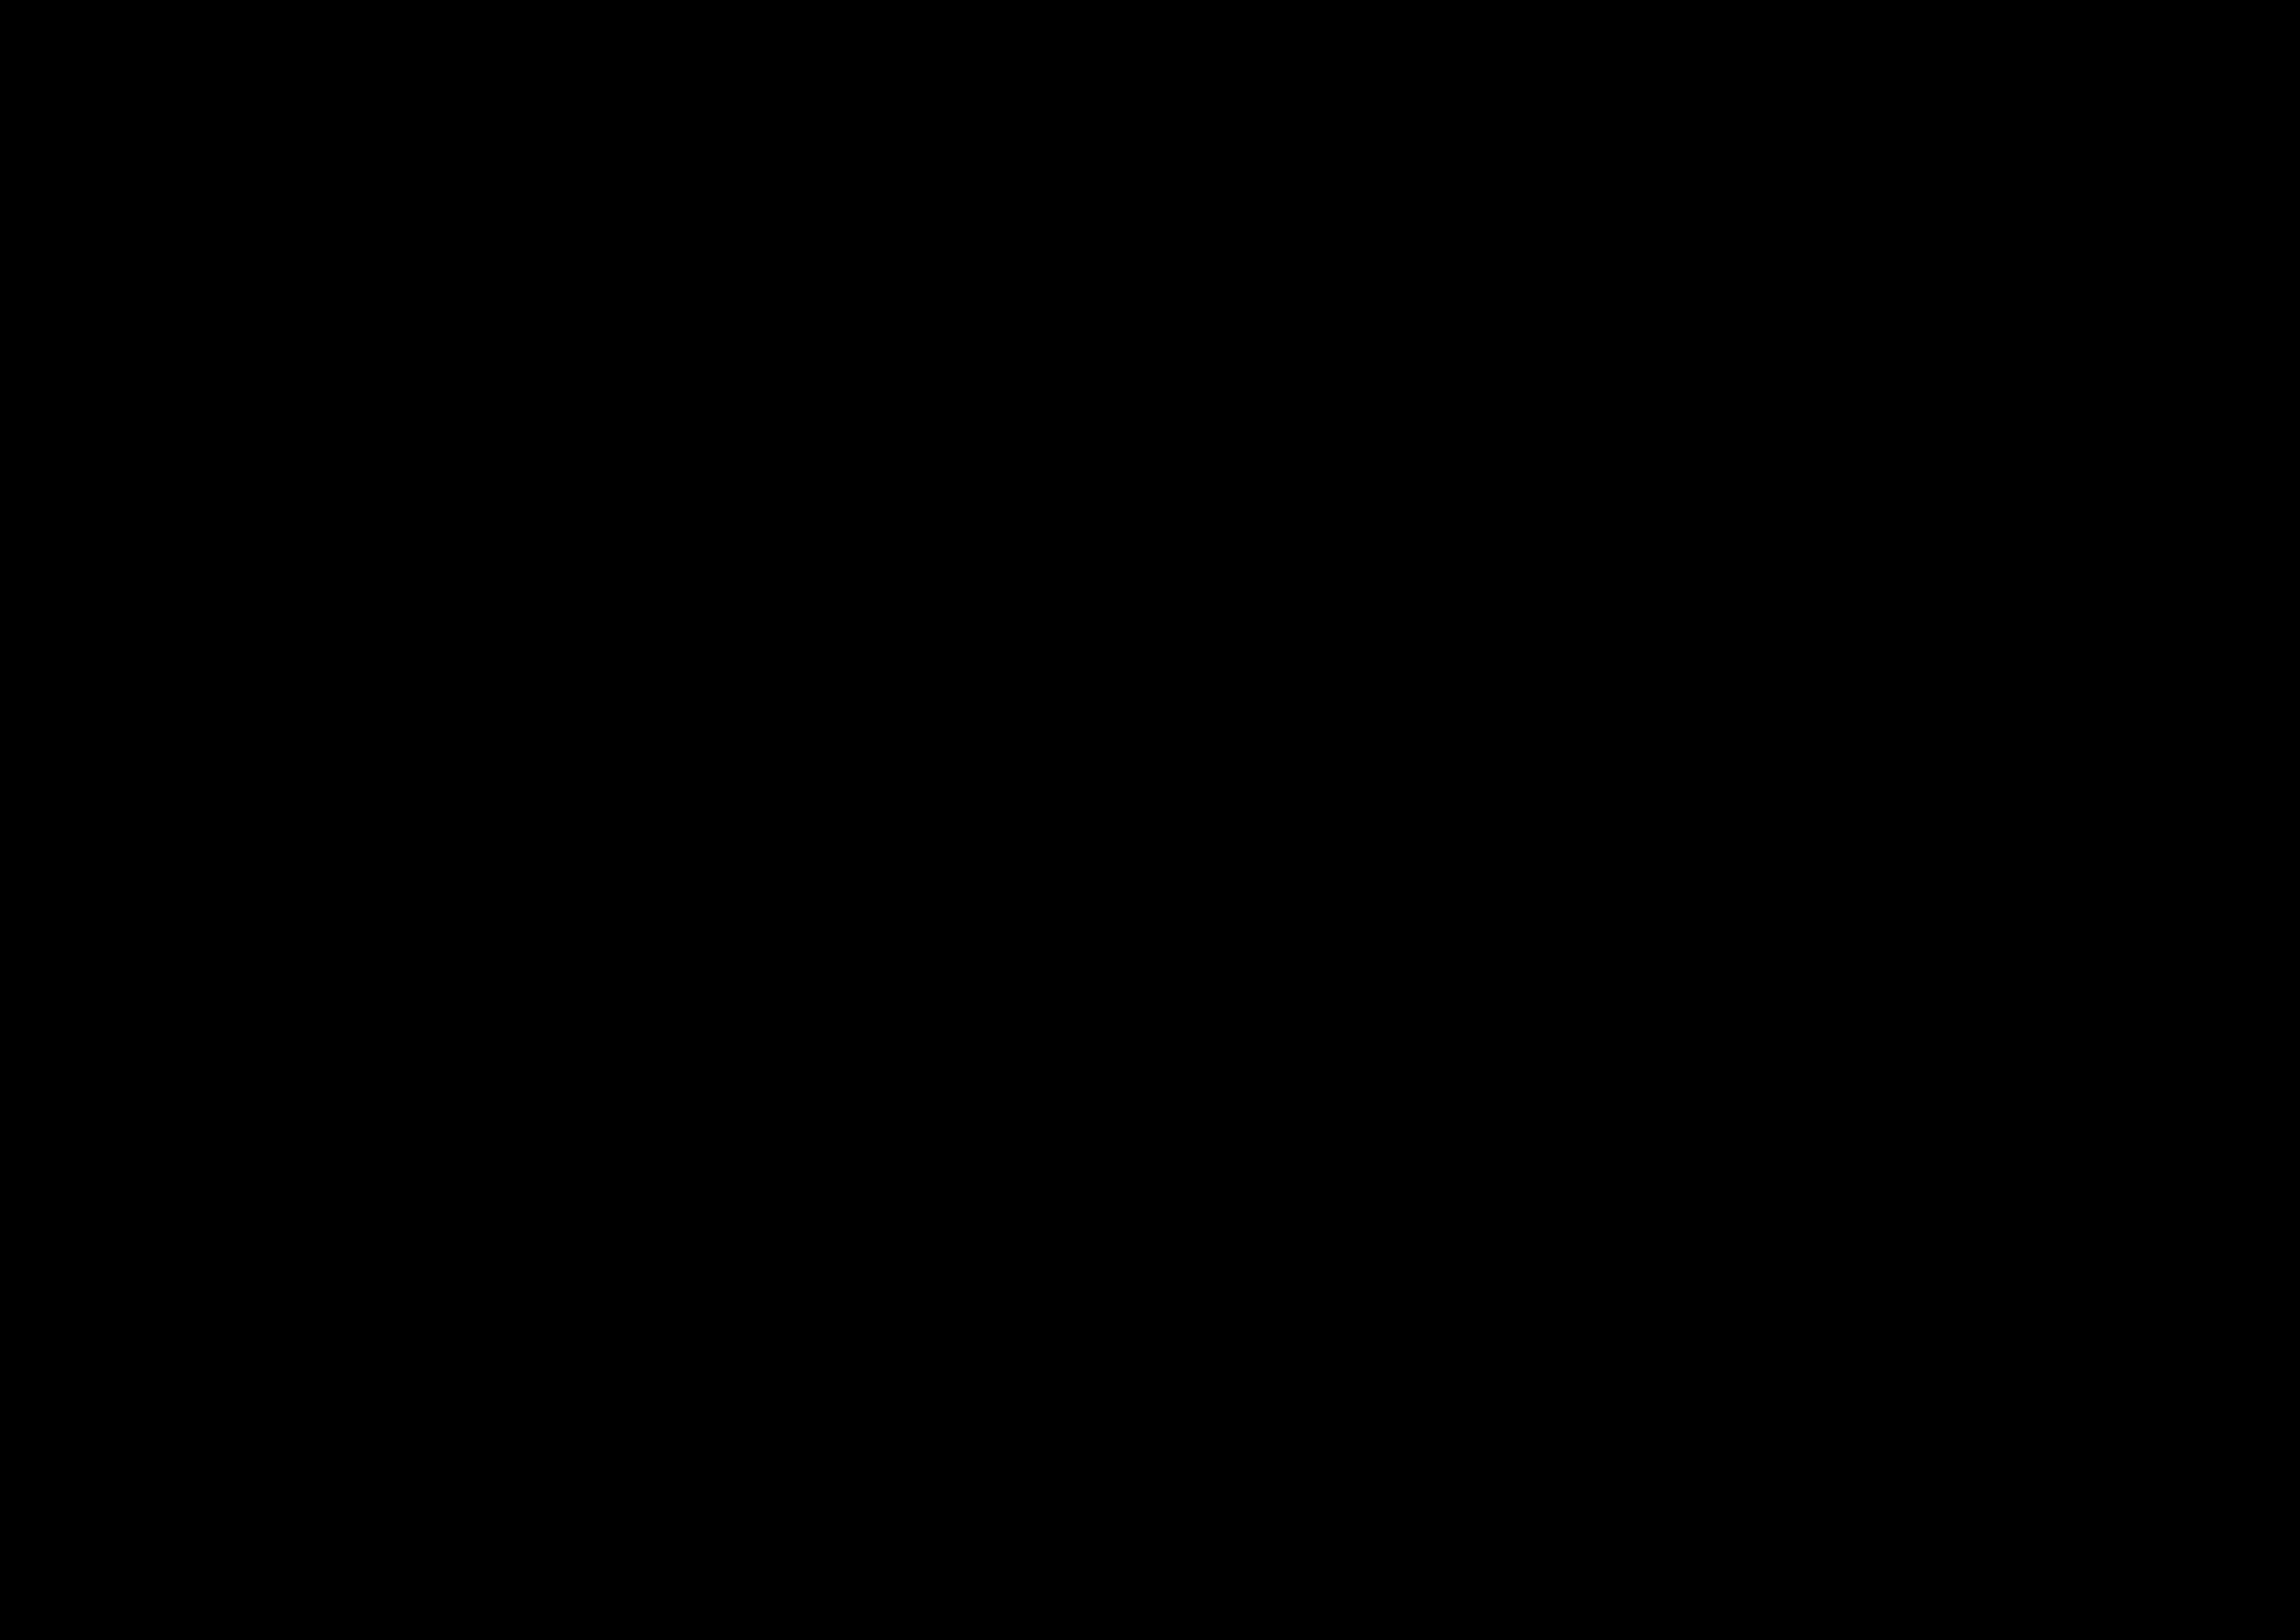 Logo Malelions